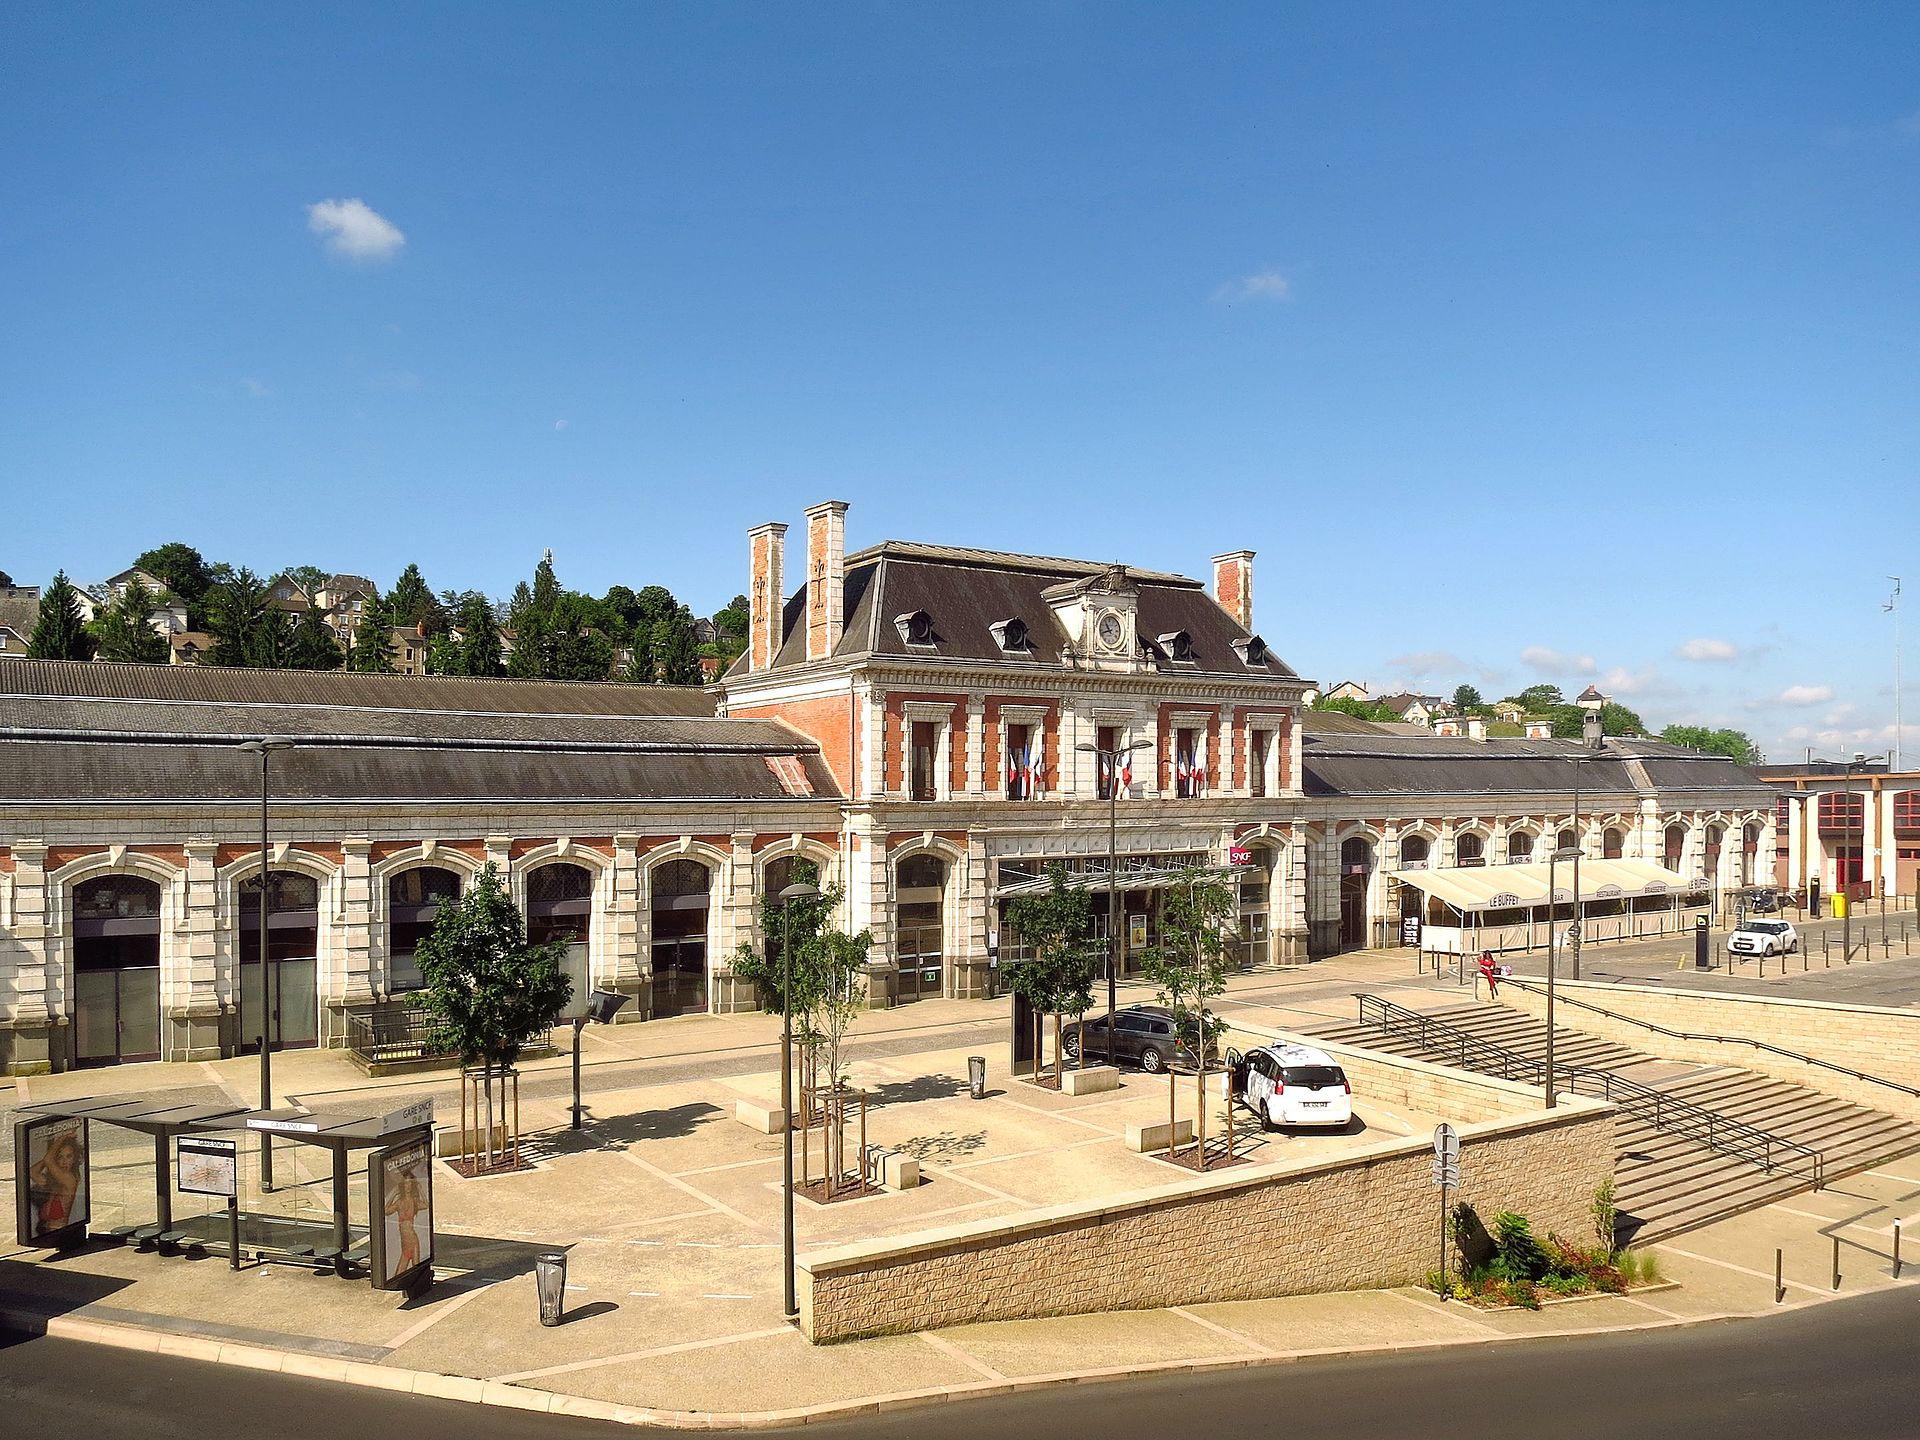 Gare de brive la gaillarde wikip dia for Garage de la gare bretigny